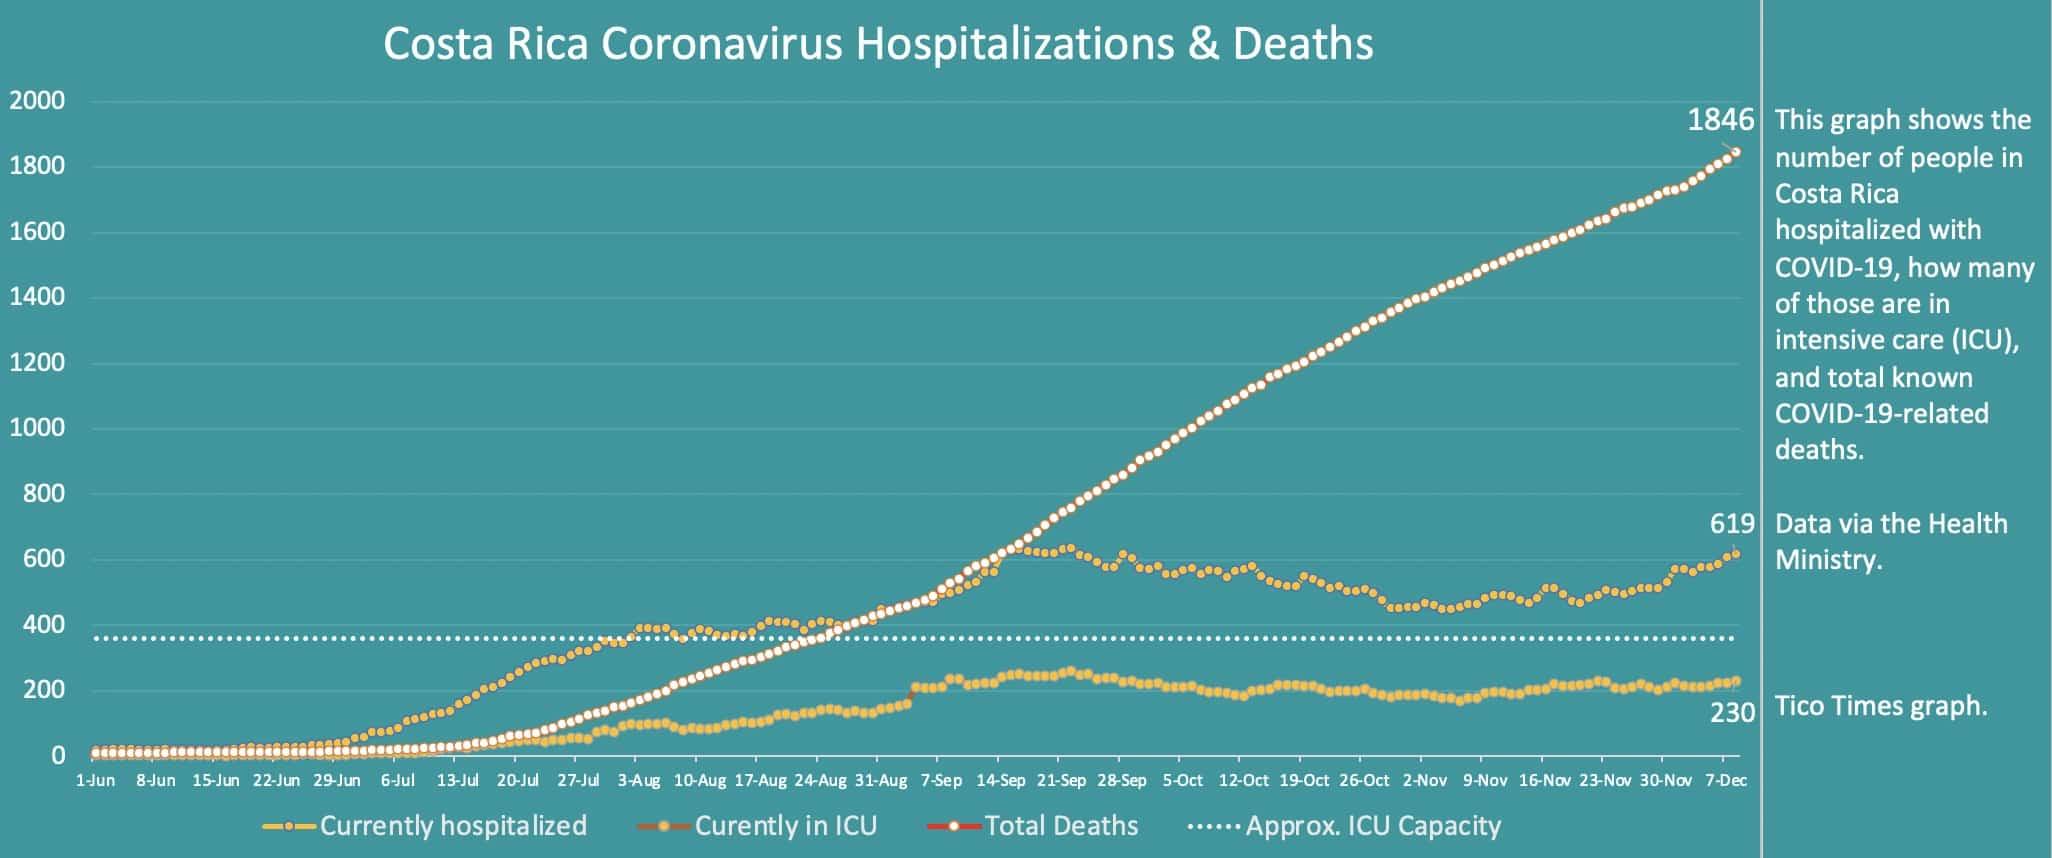 Costa Rica coronavirus hospitalizations and deaths on December 8, 2020